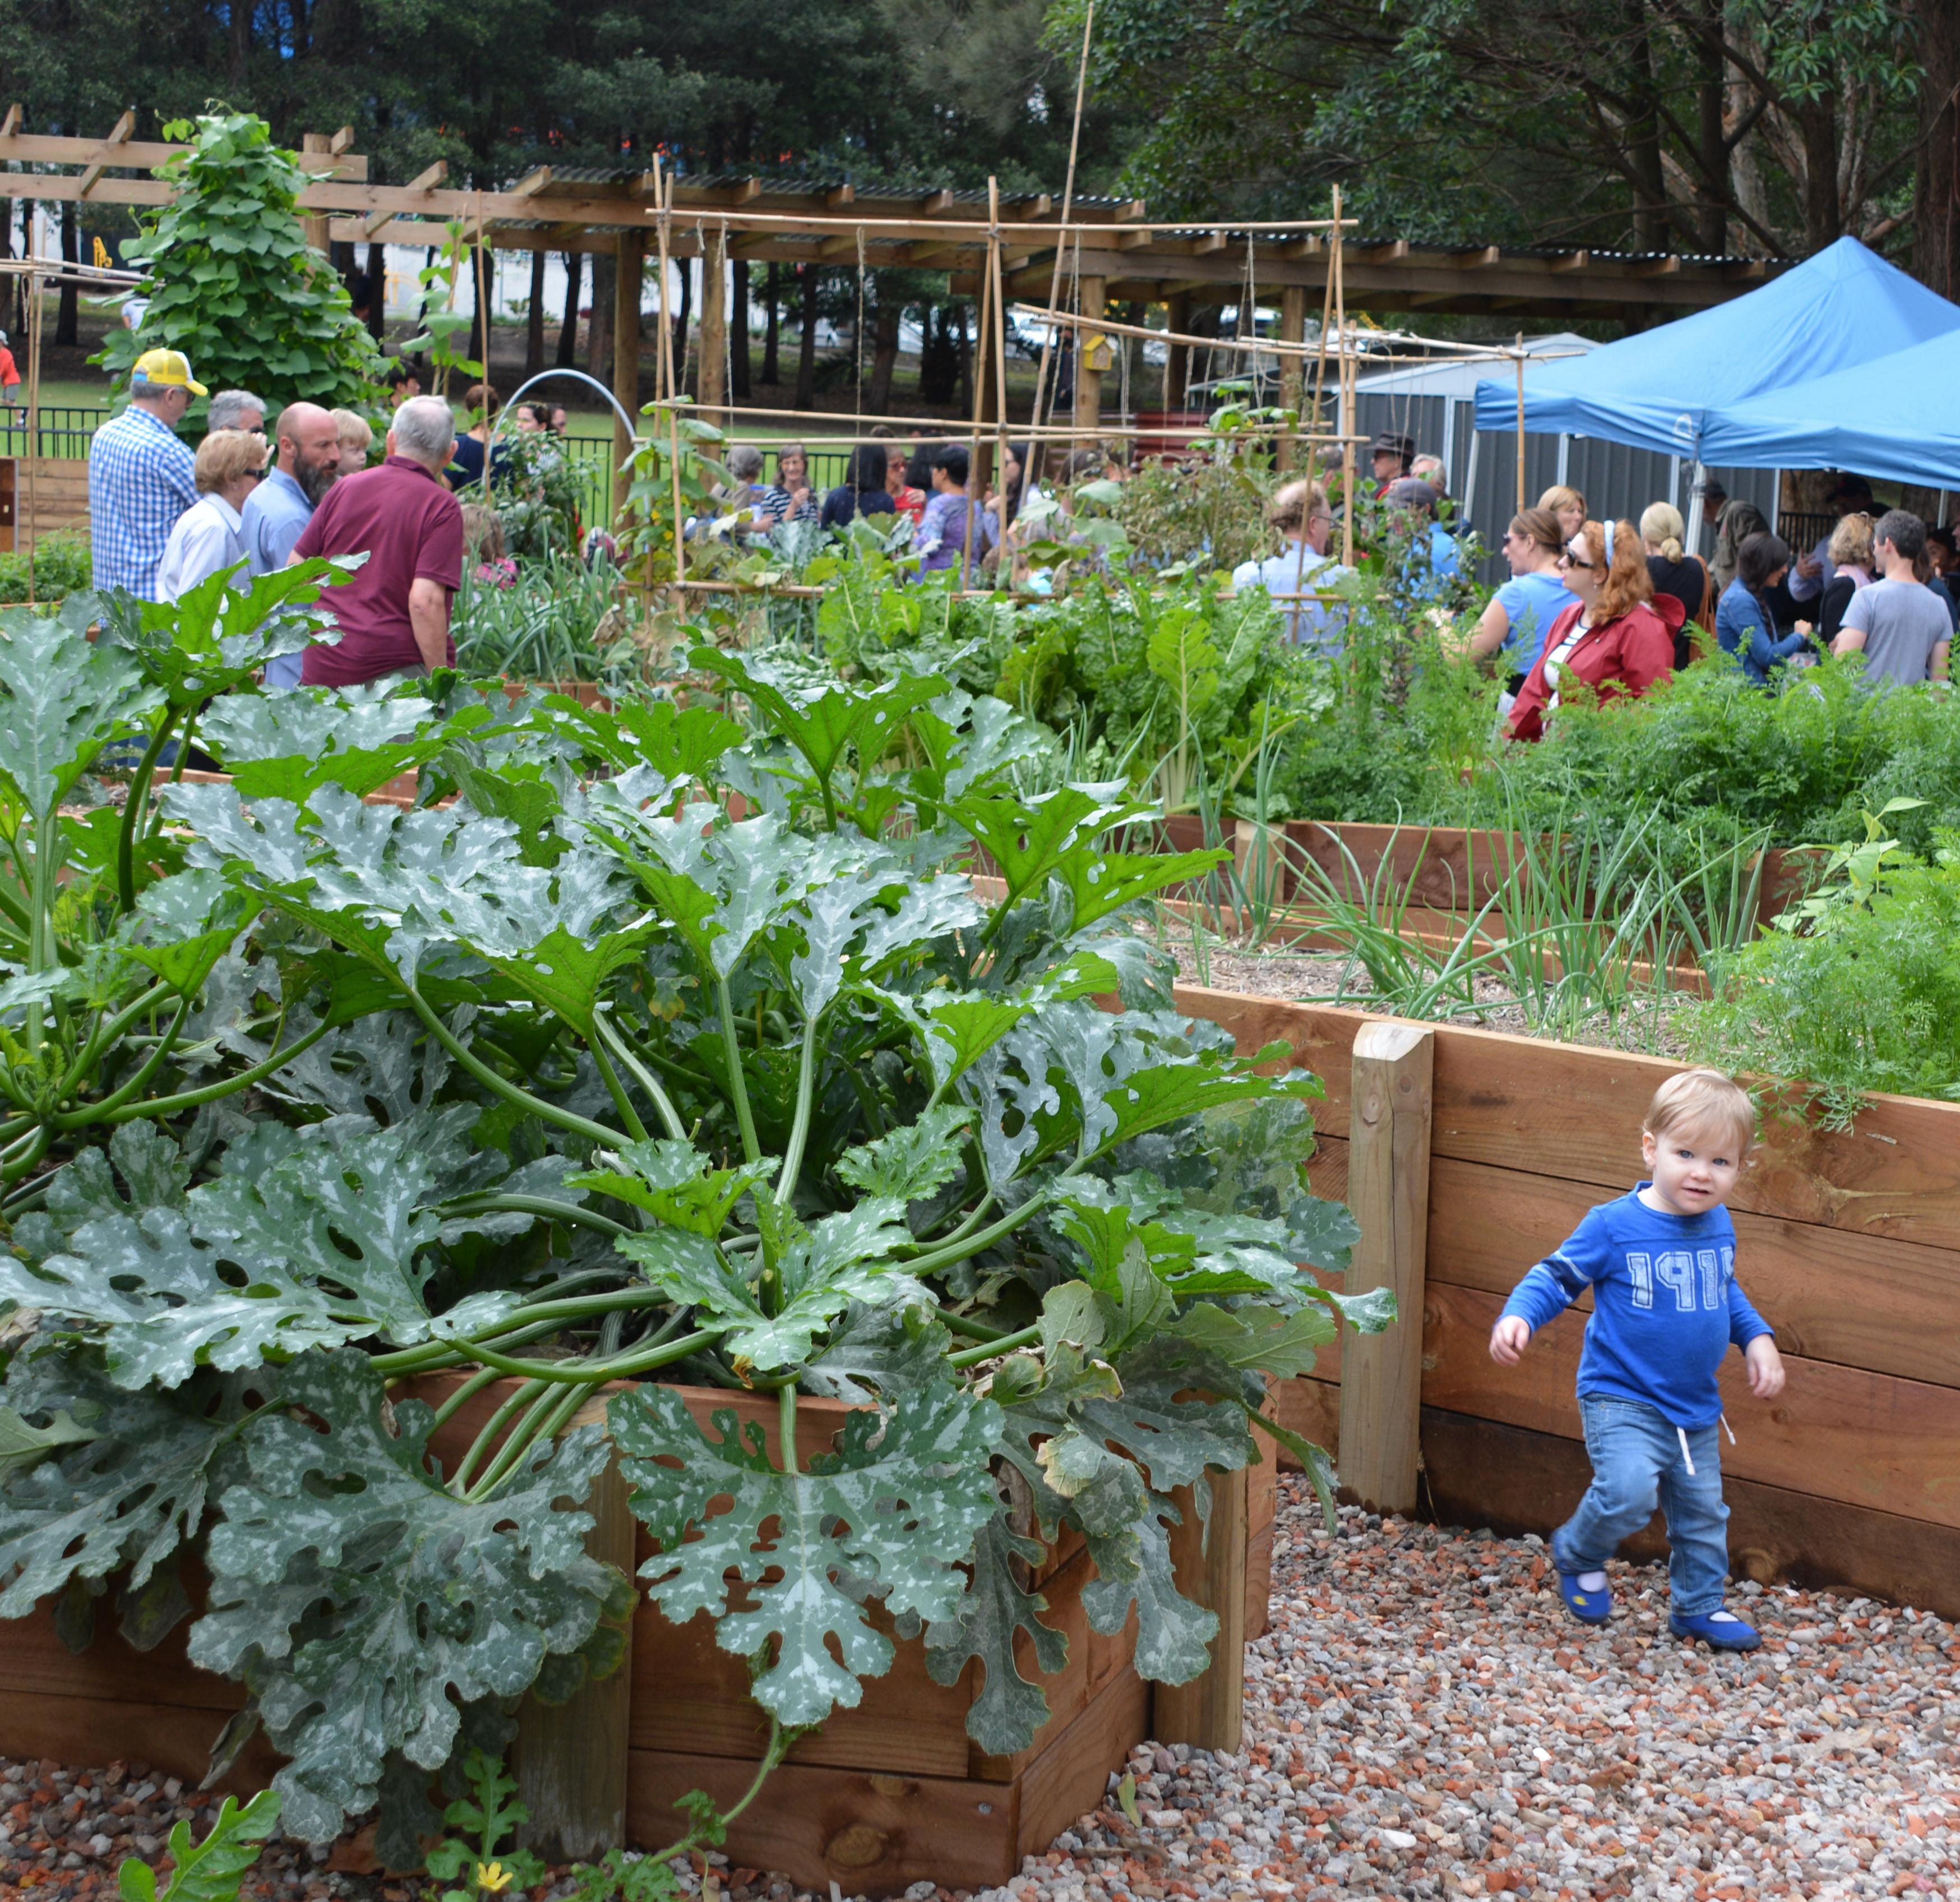 Anzac park community garden